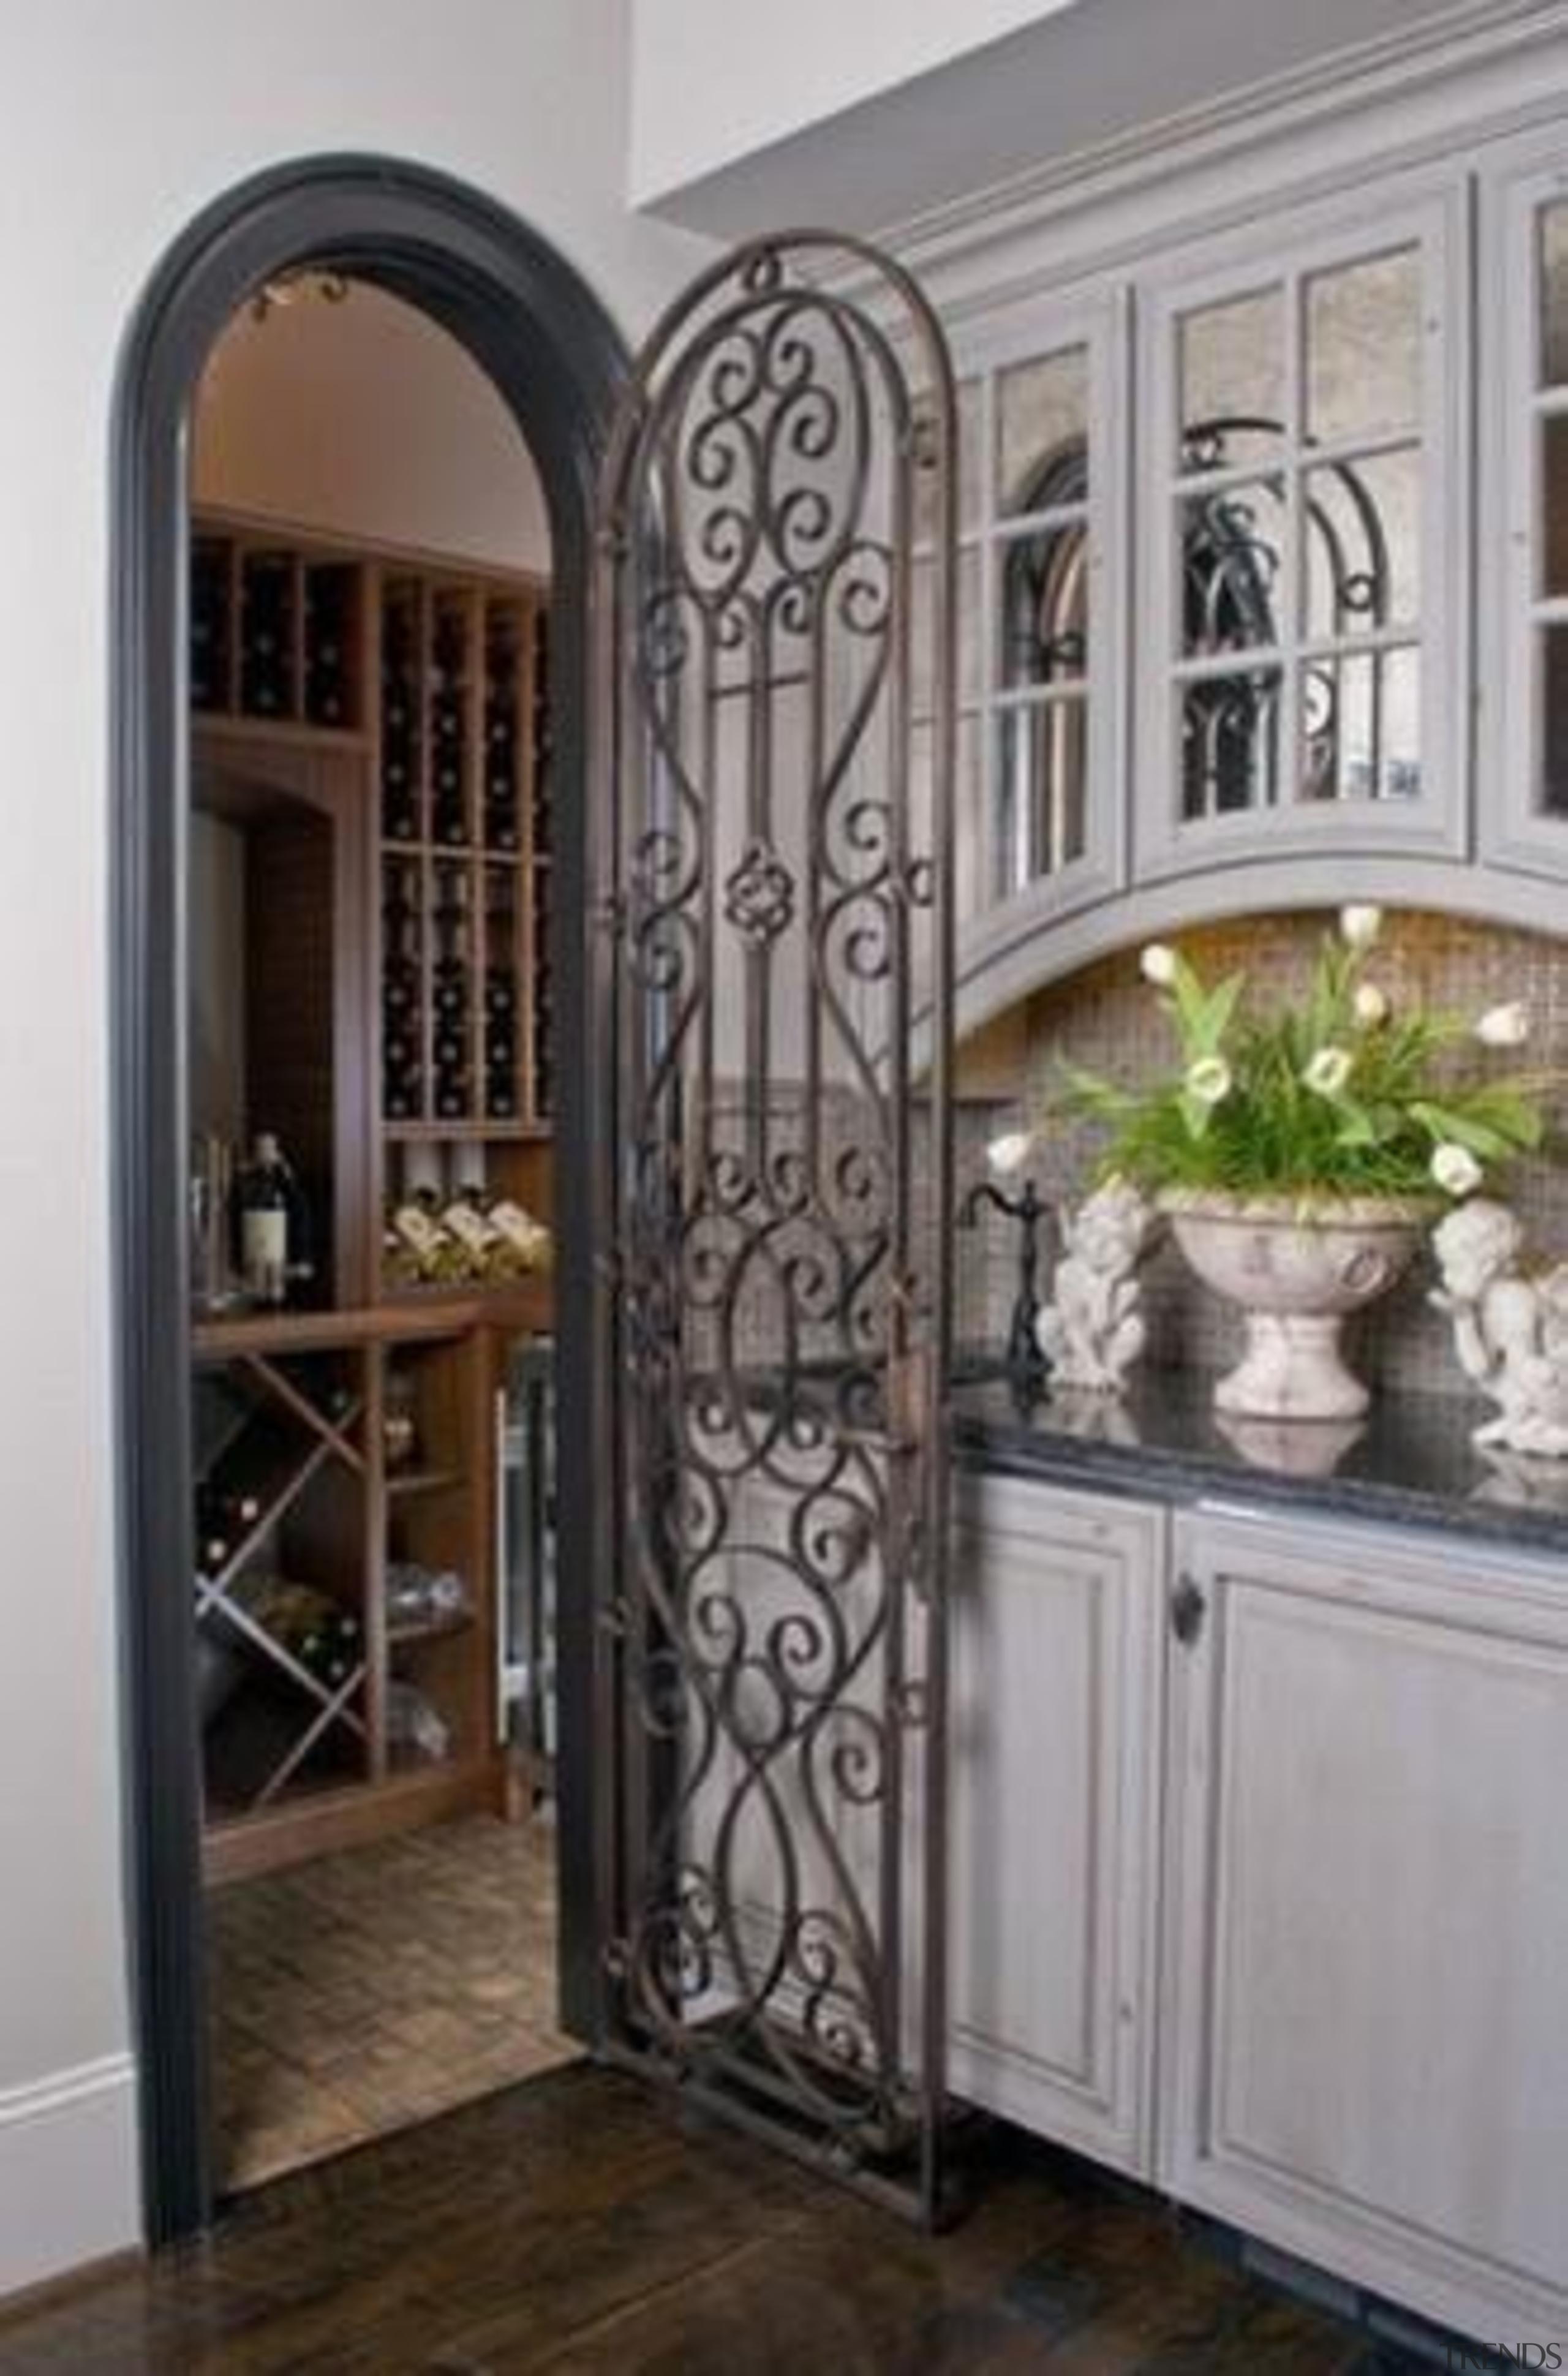 Modern Wine Cellar Ideas - Modern Wine Cellar cabinetry, door, interior design, iron, window, gray, black